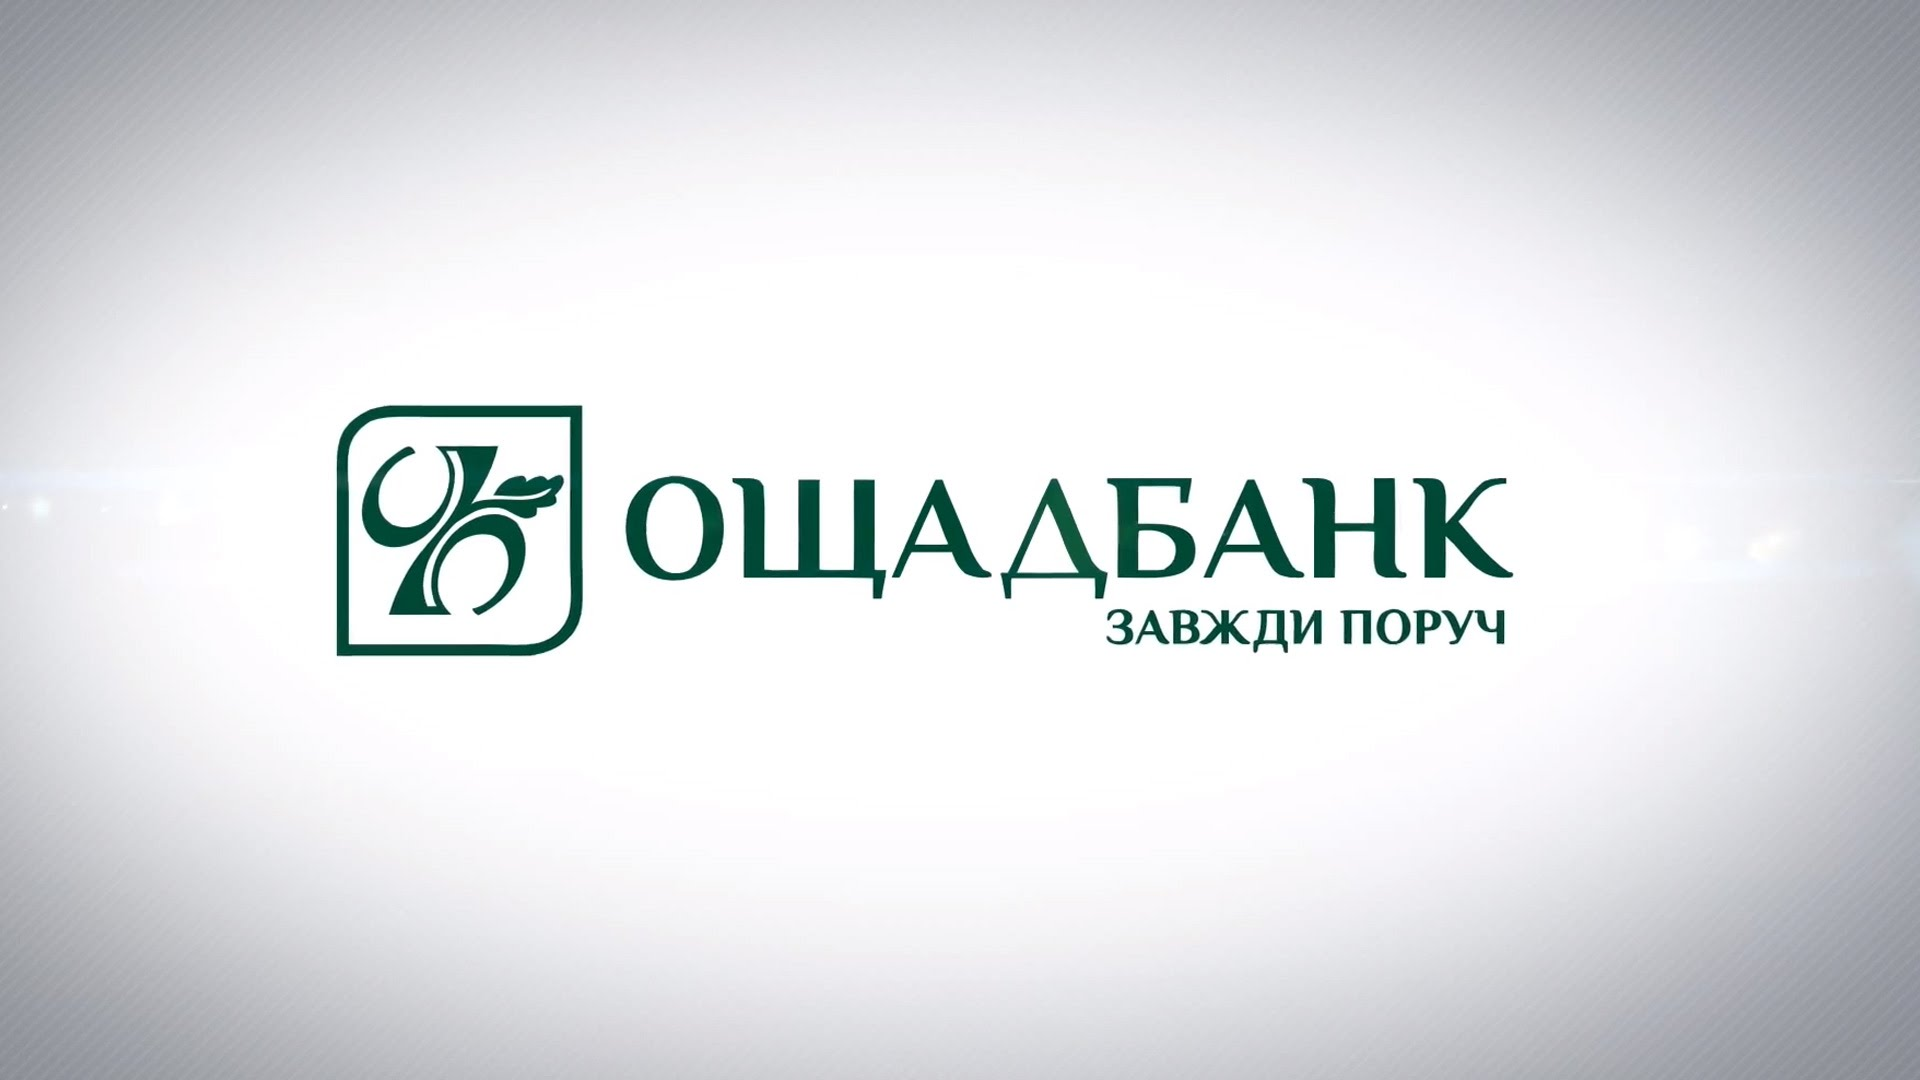 23 отделения «Ощадбанка» выставят на аукцион